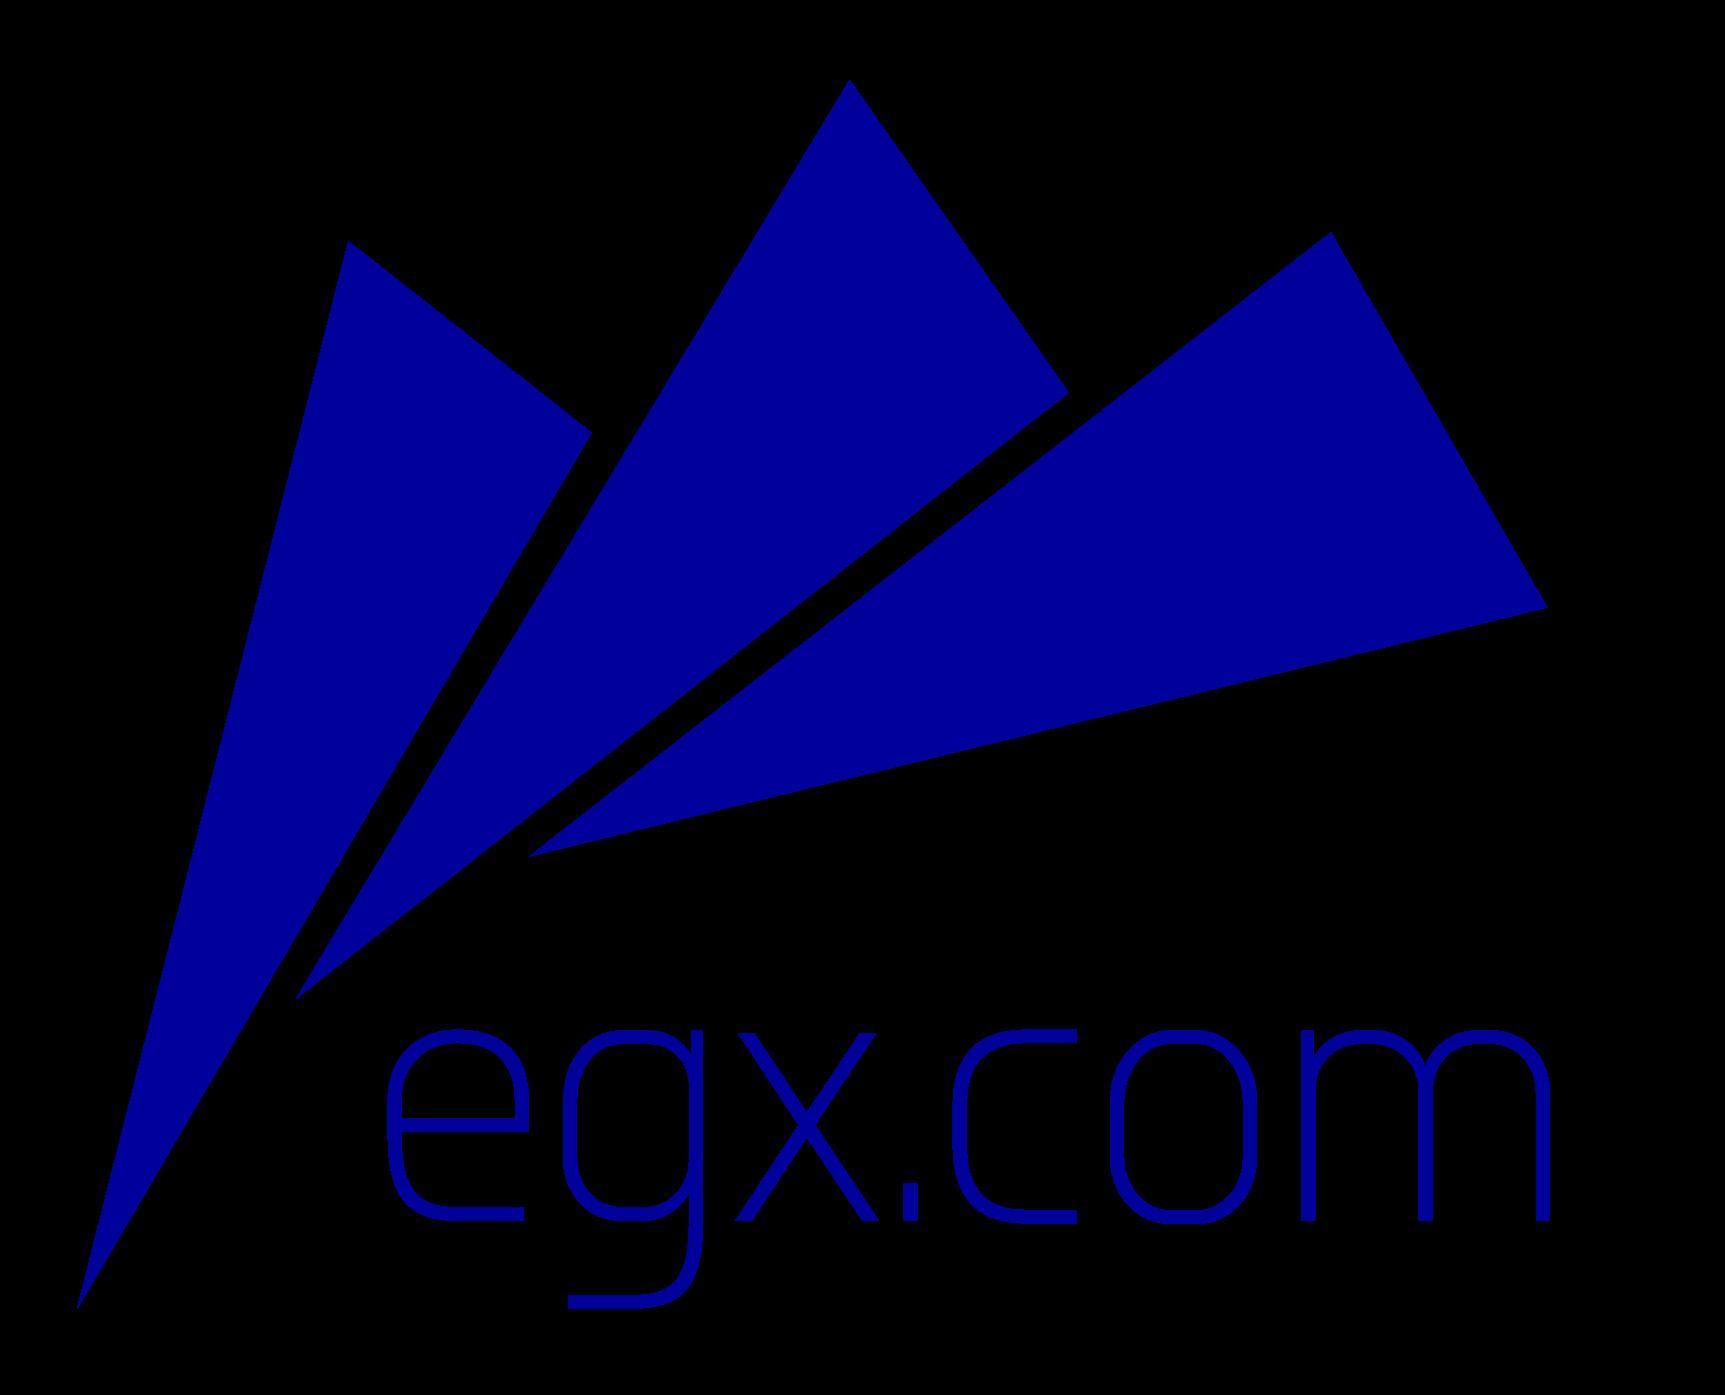 EGXLogo-text-v1.png